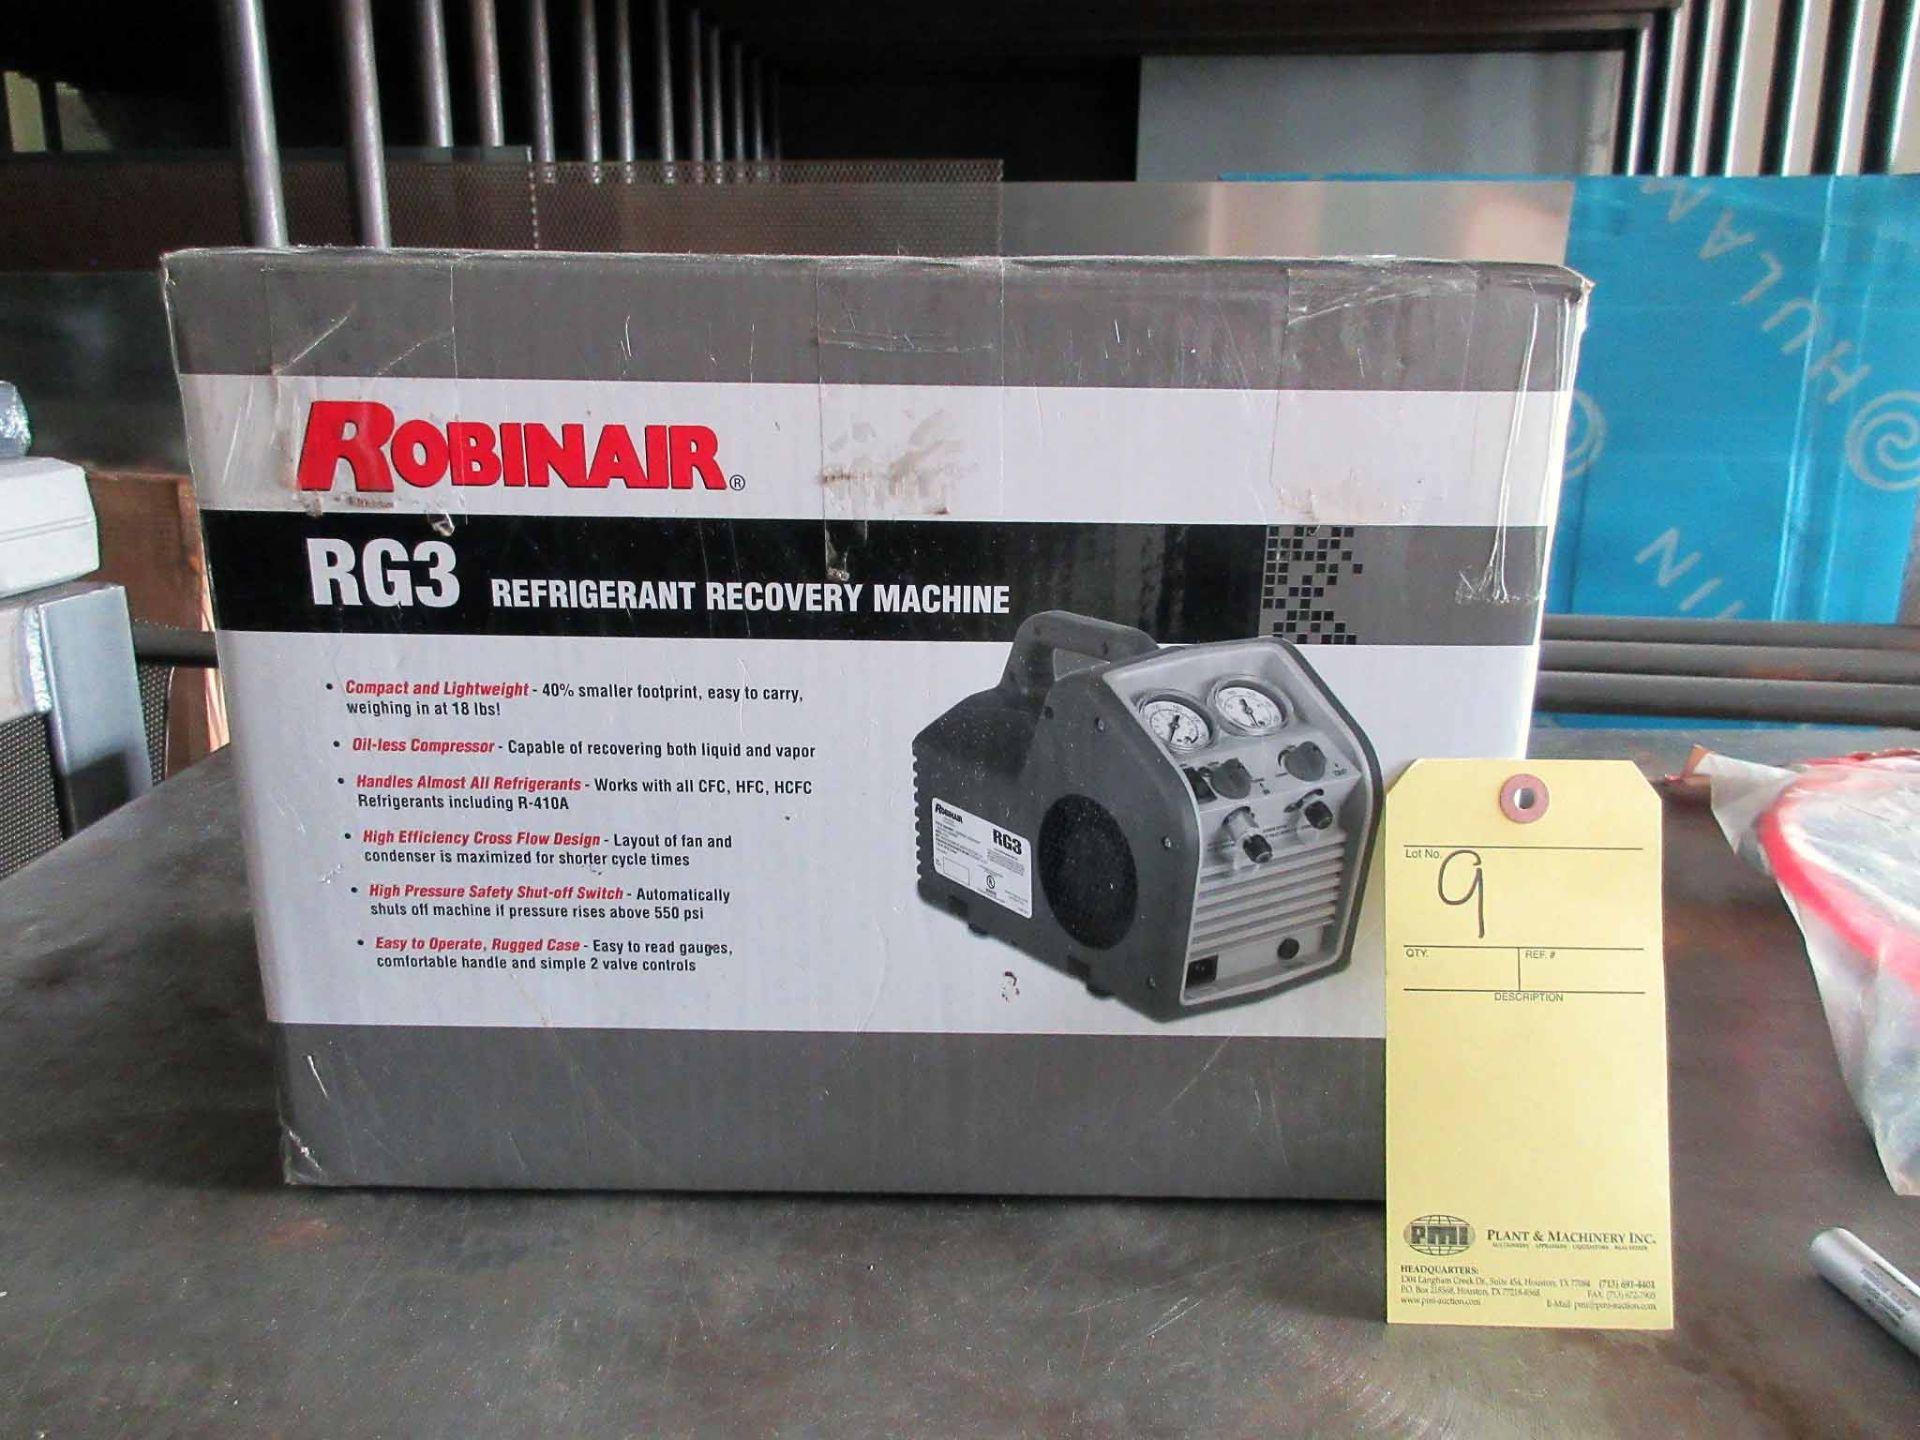 Lot 9 - REFRIGERANT RECOVERY MACHINE, ROBINAIR MDL. RG3 (new in box)